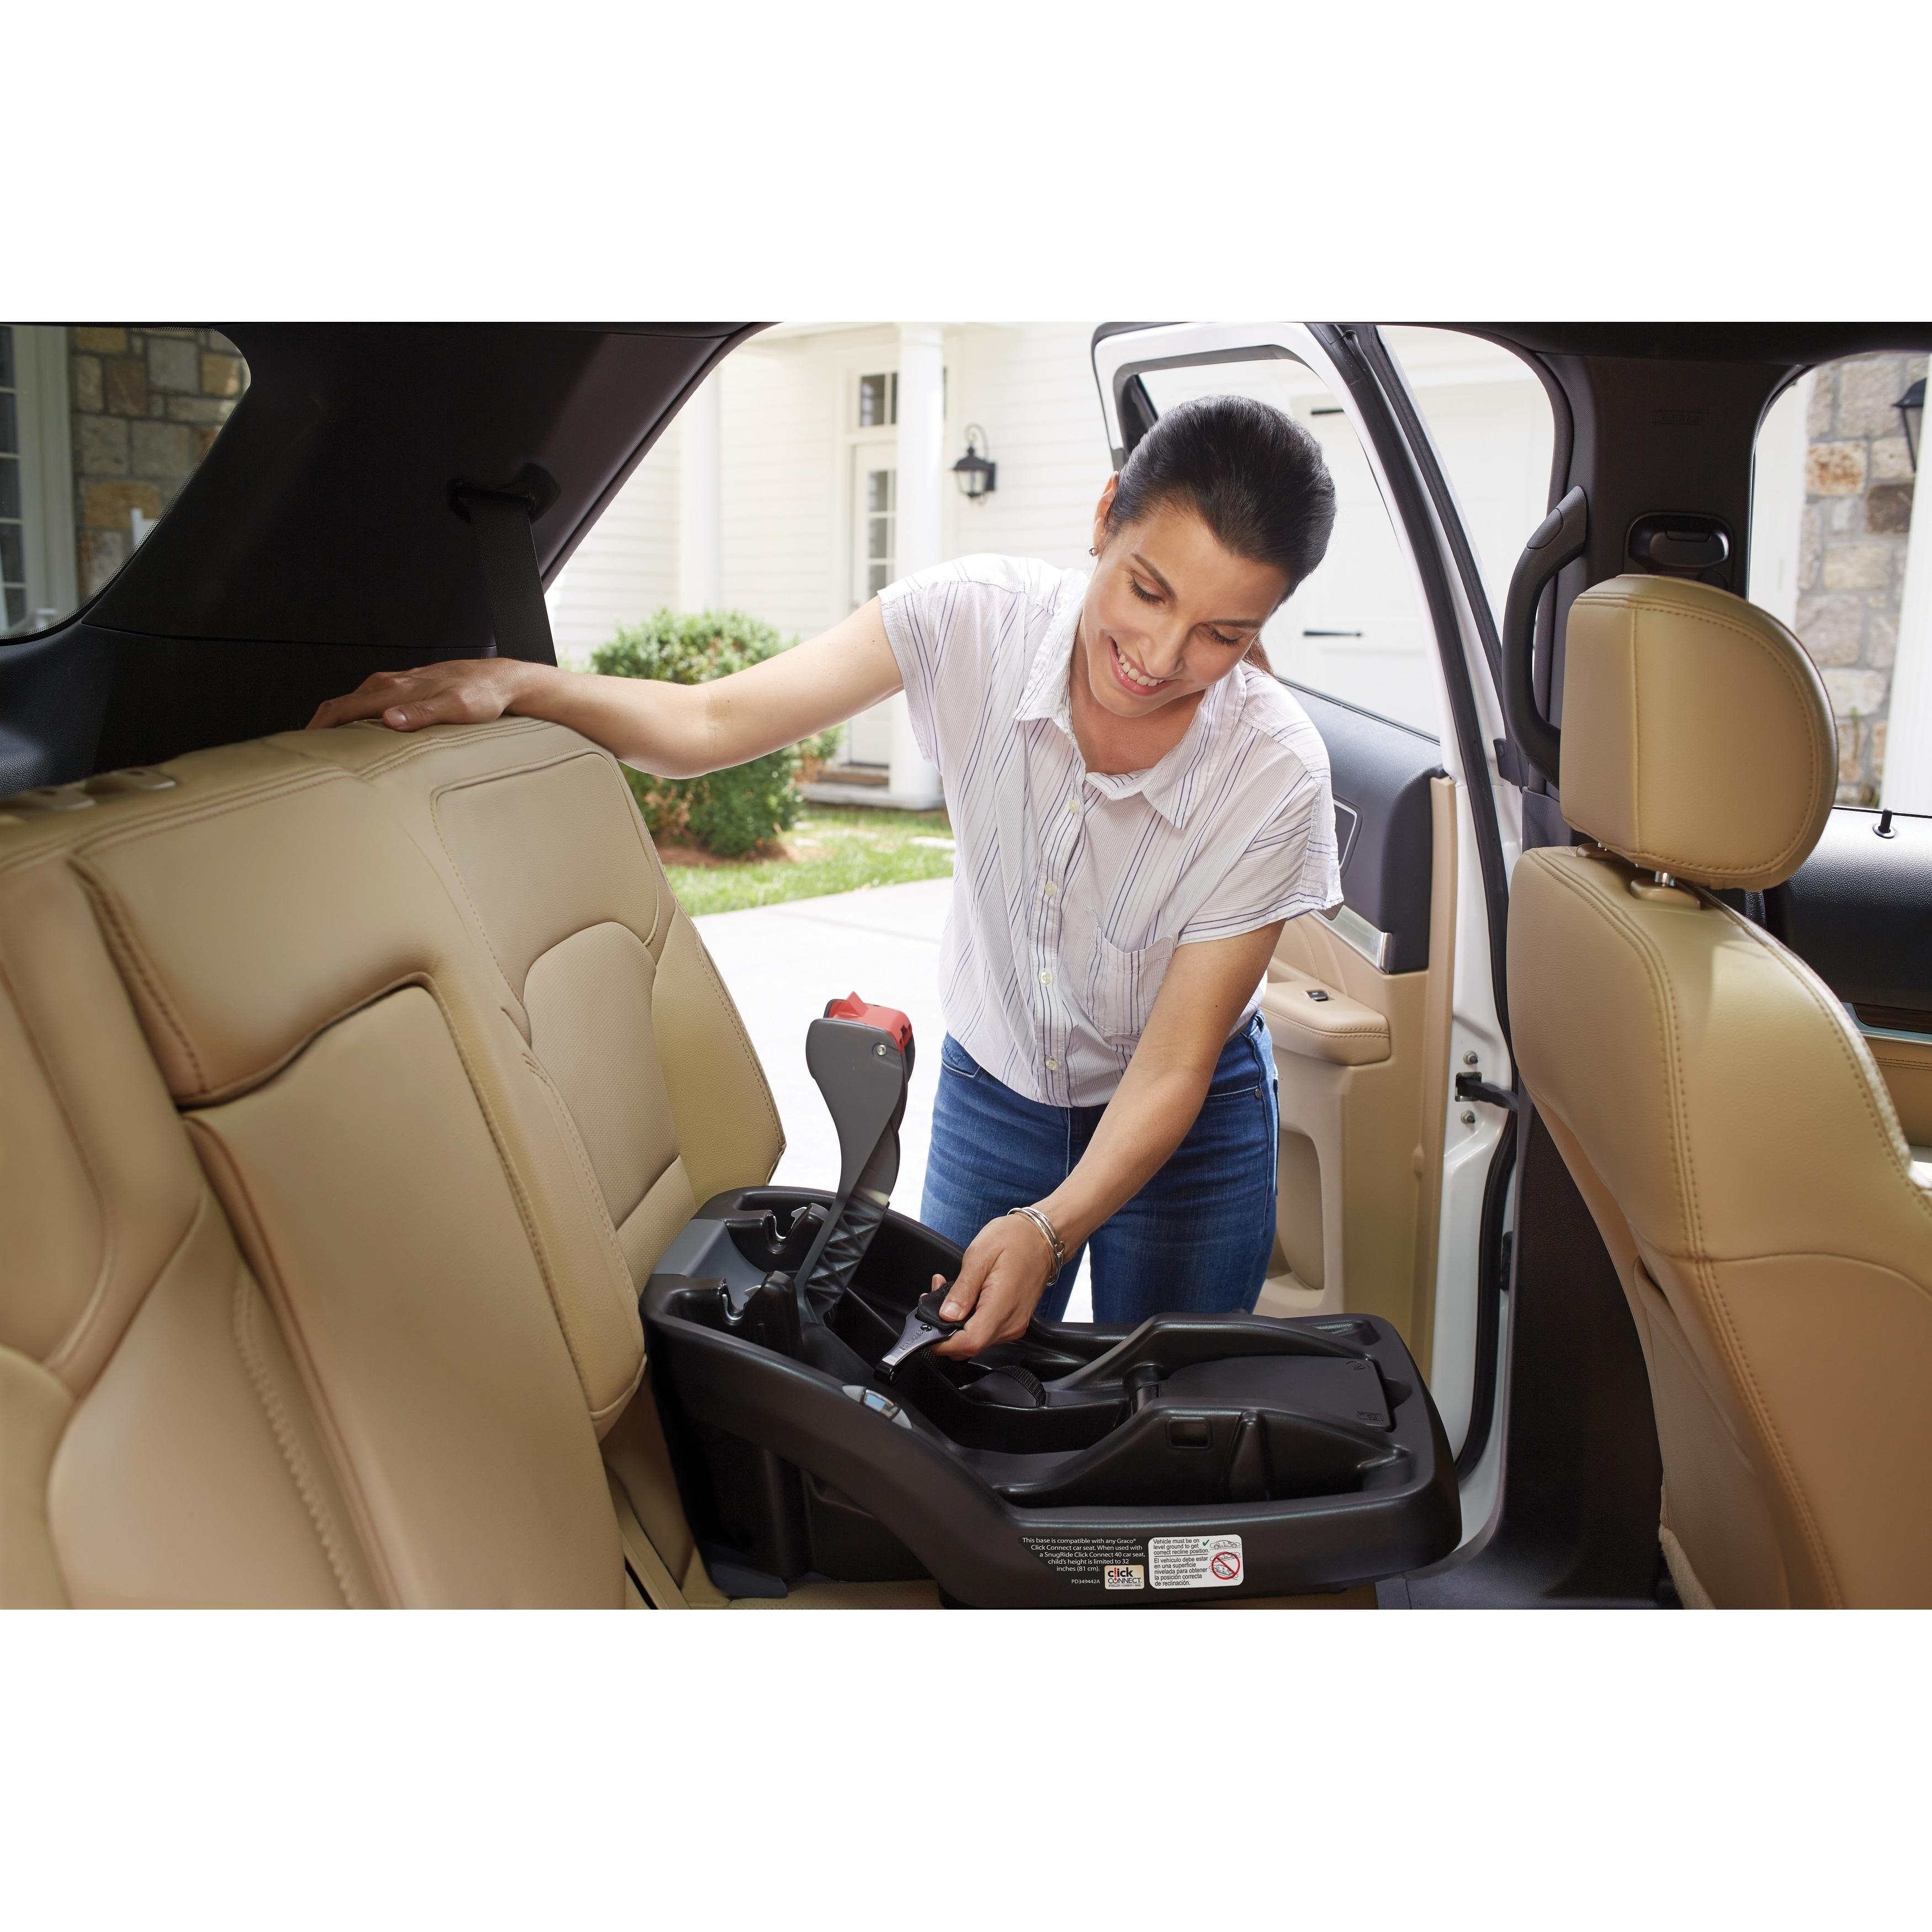 Peachy Graco Snugride Snuglock Infant Car Seat Base Black Alphanode Cool Chair Designs And Ideas Alphanodeonline